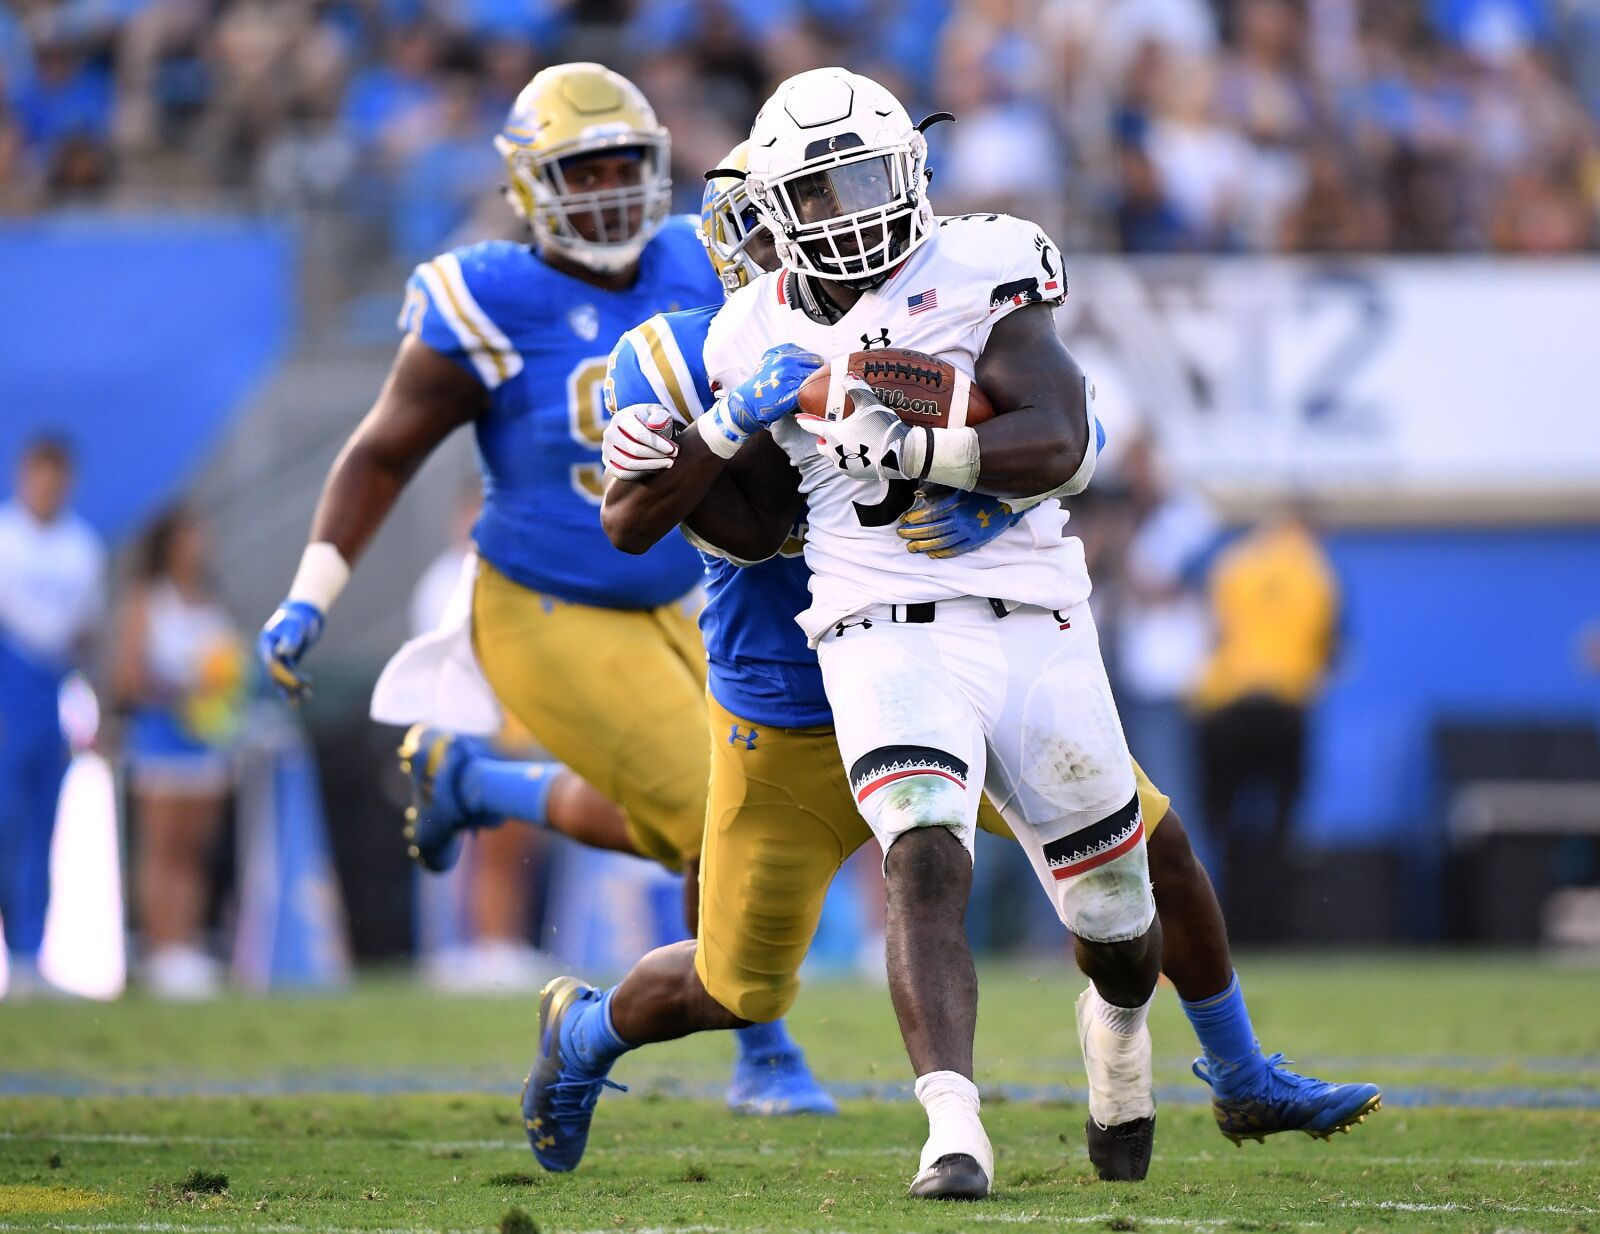 UCLA Bruins Football 2019 Season Preview Part 2: Cincinnati Running Game